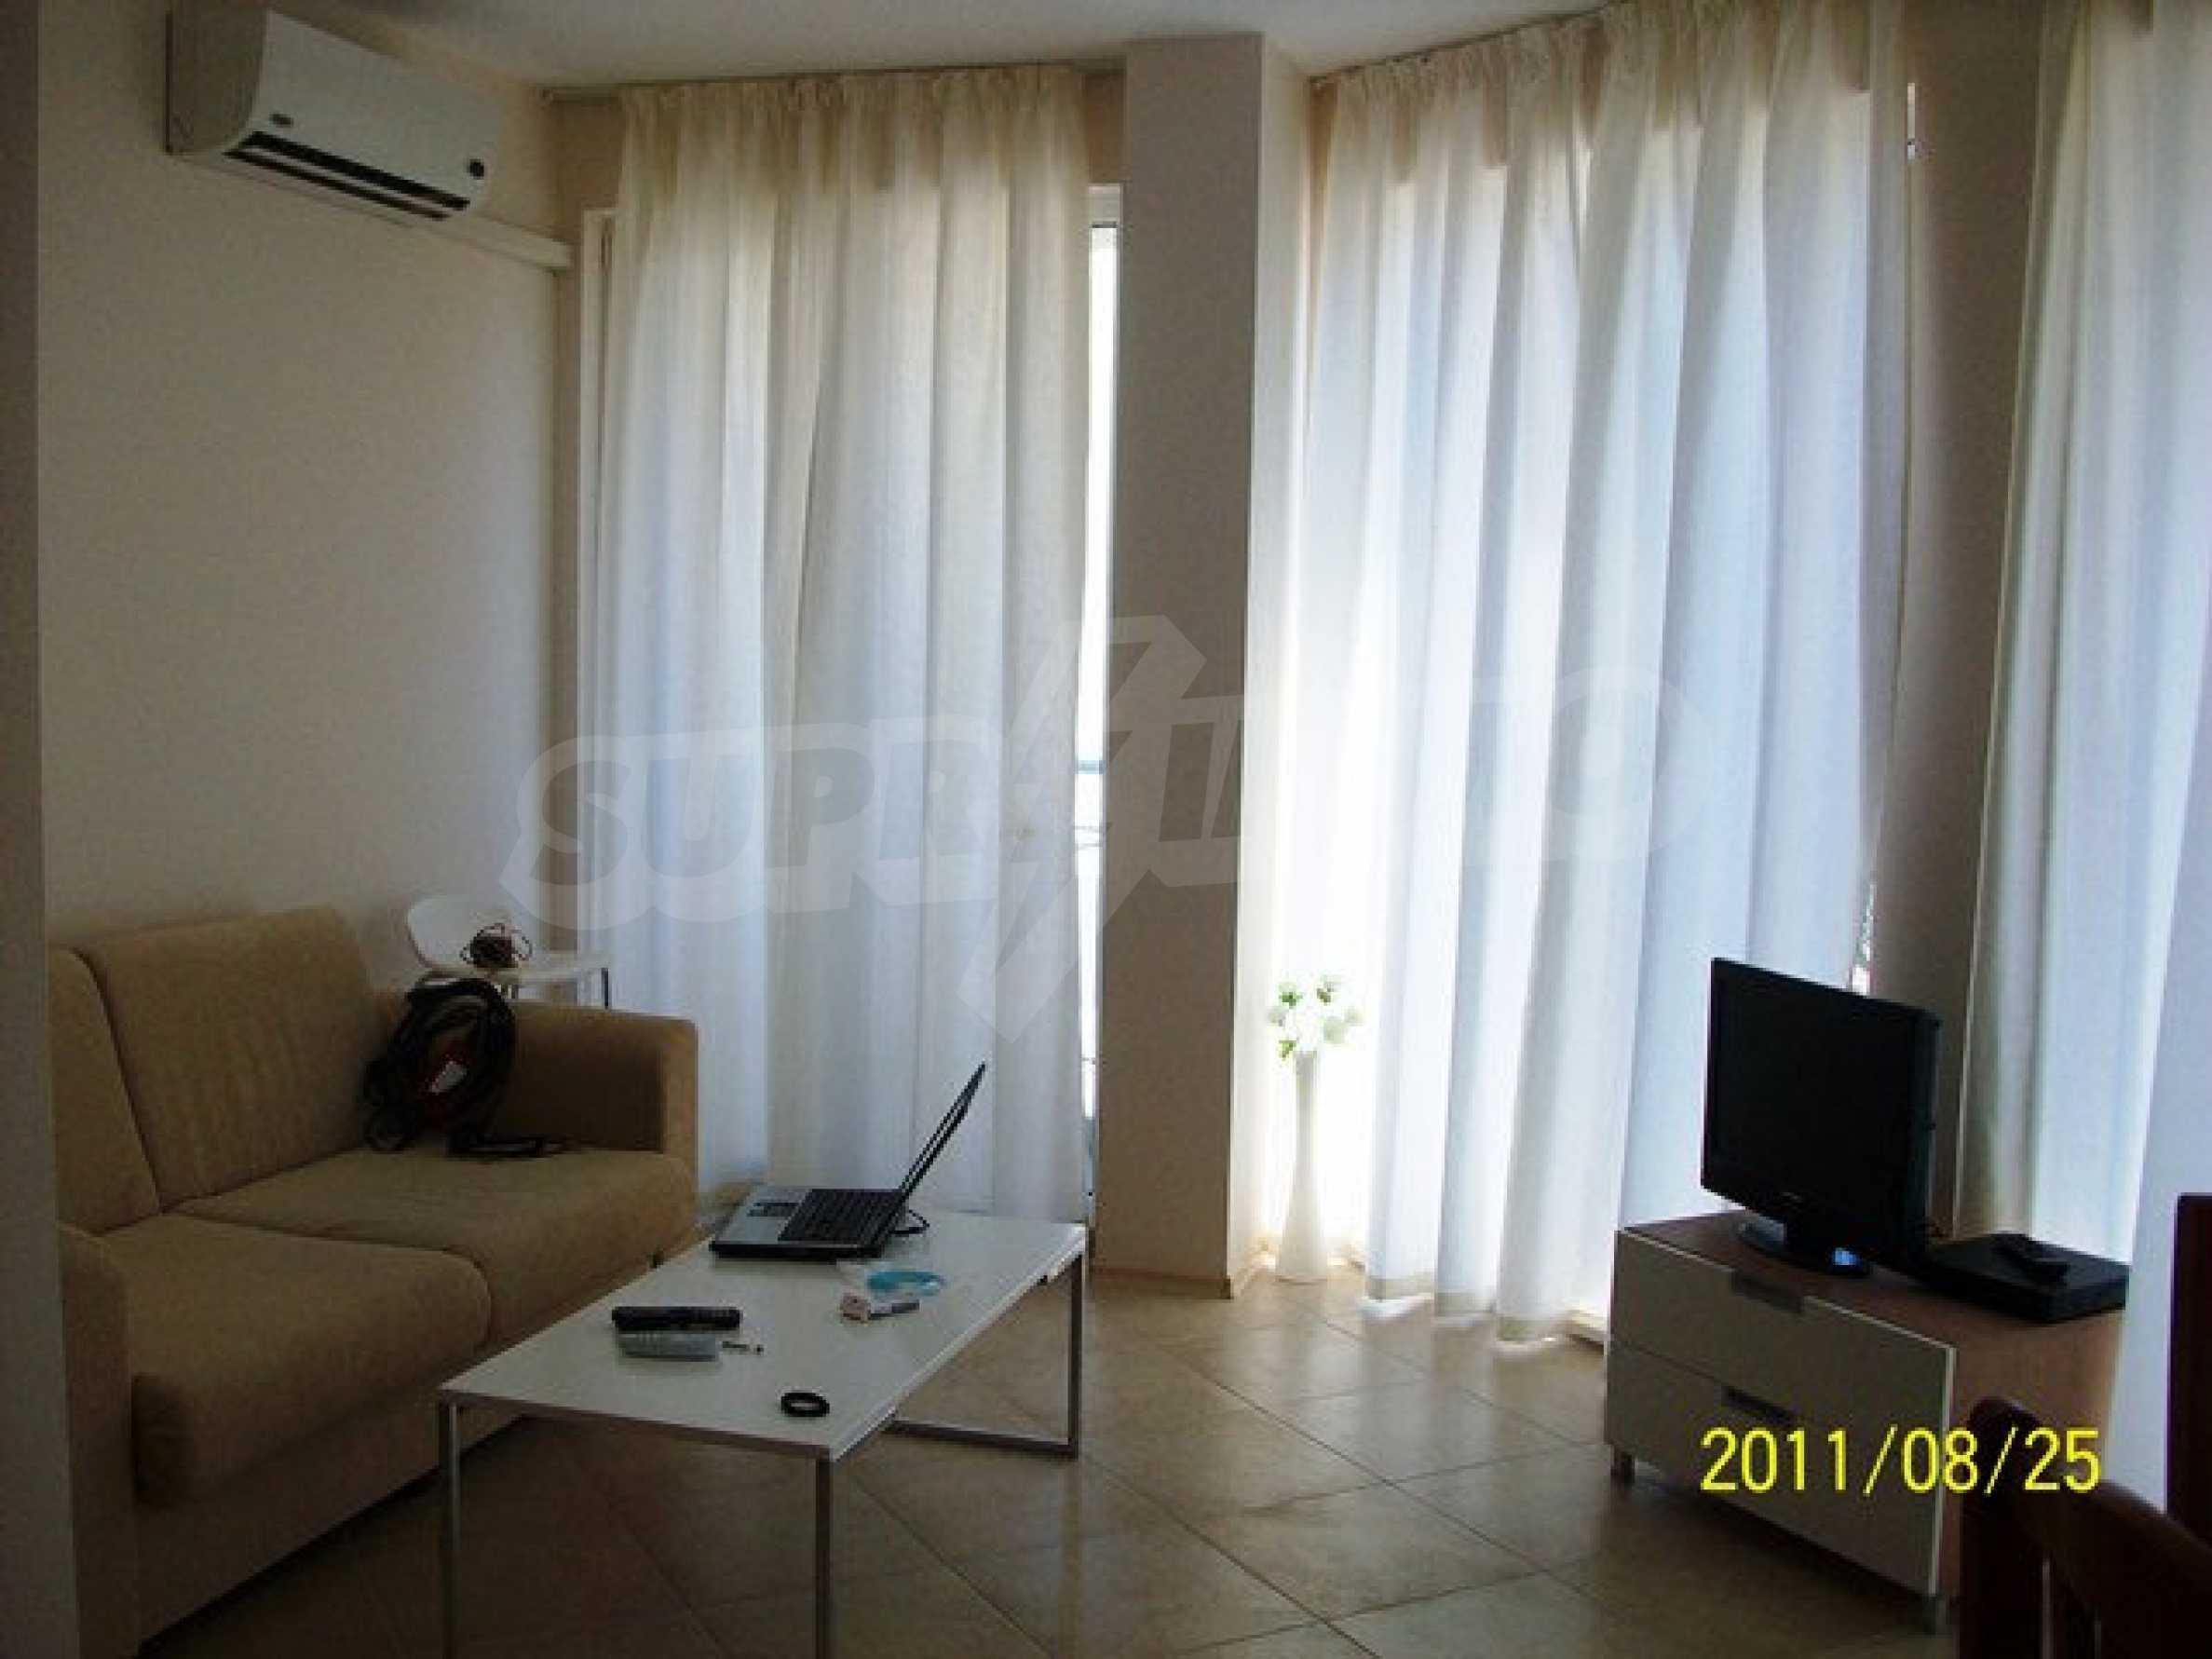 Трехкомнатный апартамент на продажу в комплексе Emberli в курорте Лозенец 16